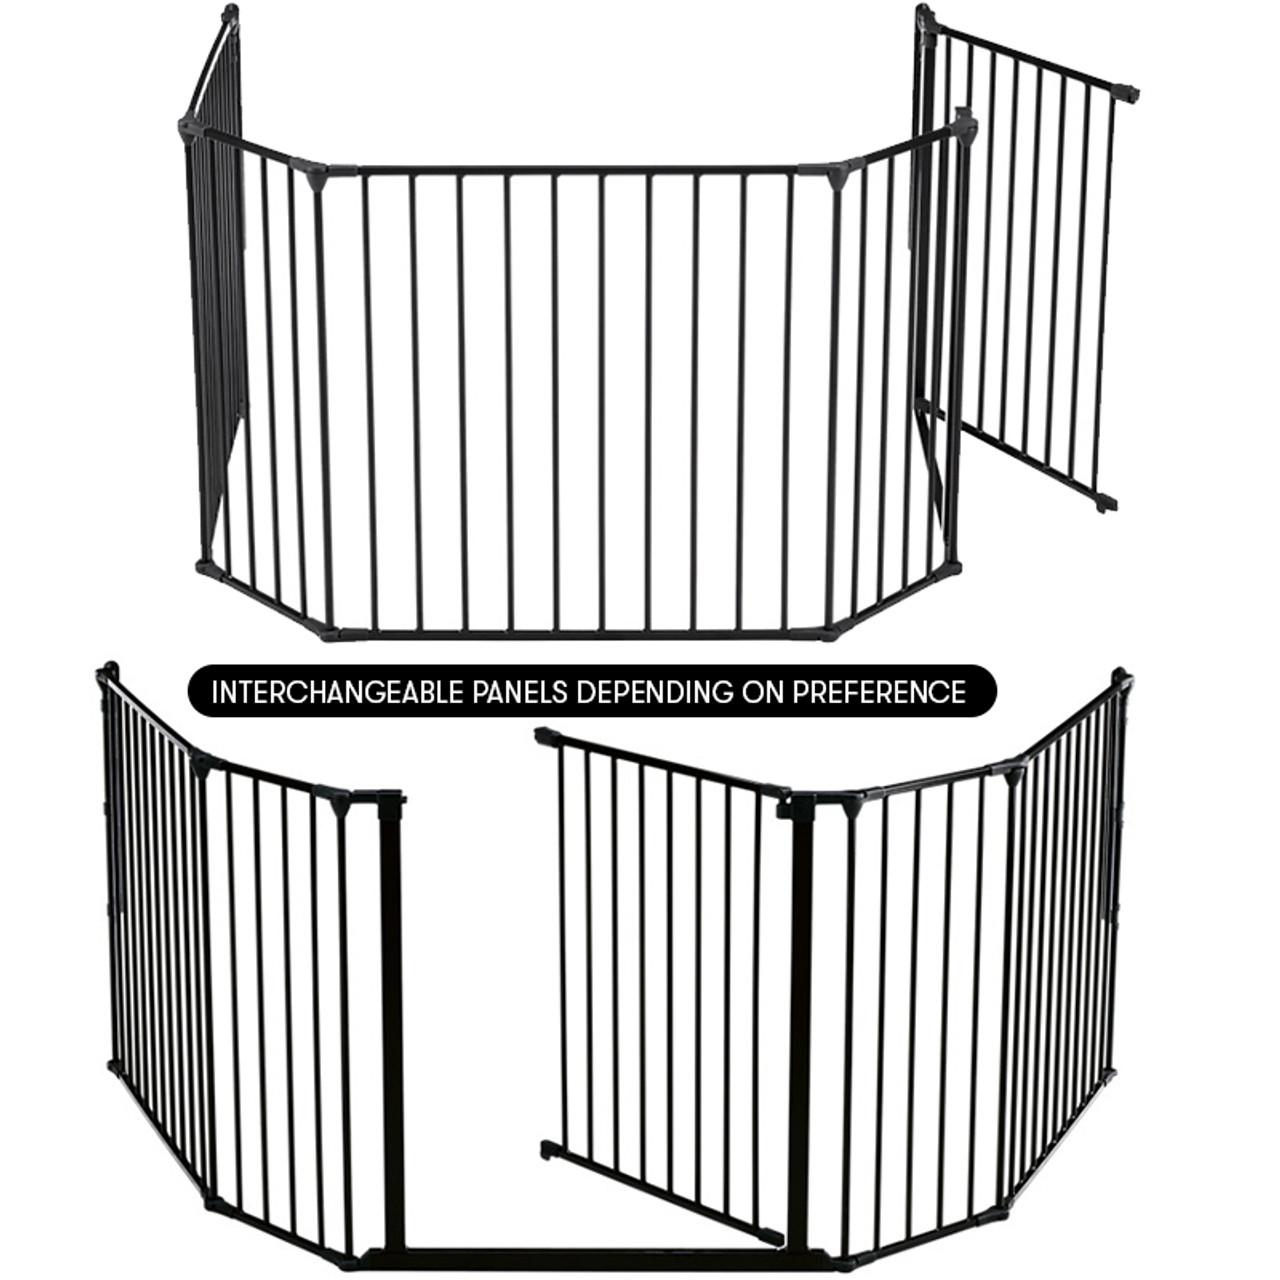 HEARTH GATE BABY SAFETY GATE 33CM EXTENSION NEW BABYDAN BLACK CONFIGURE